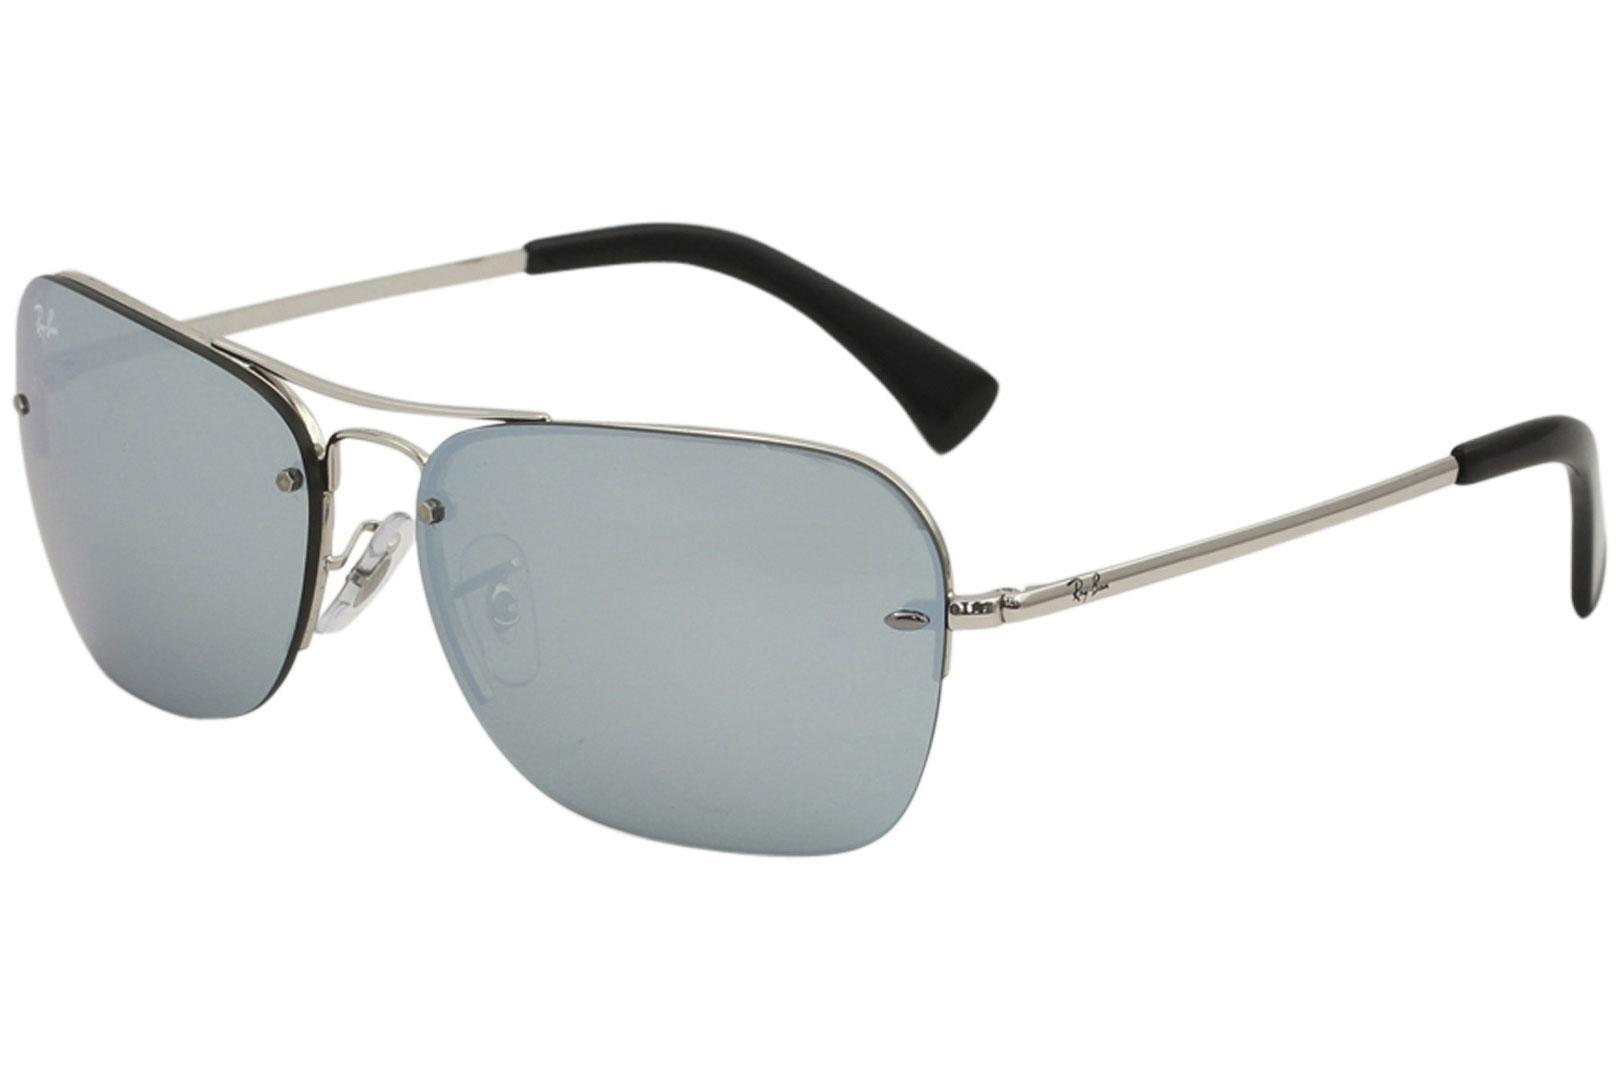 e97634cebd162 Ray Ban Men s RB3541 RB 3541 RayBan Fashion Square Sunglasses by Ray Ban